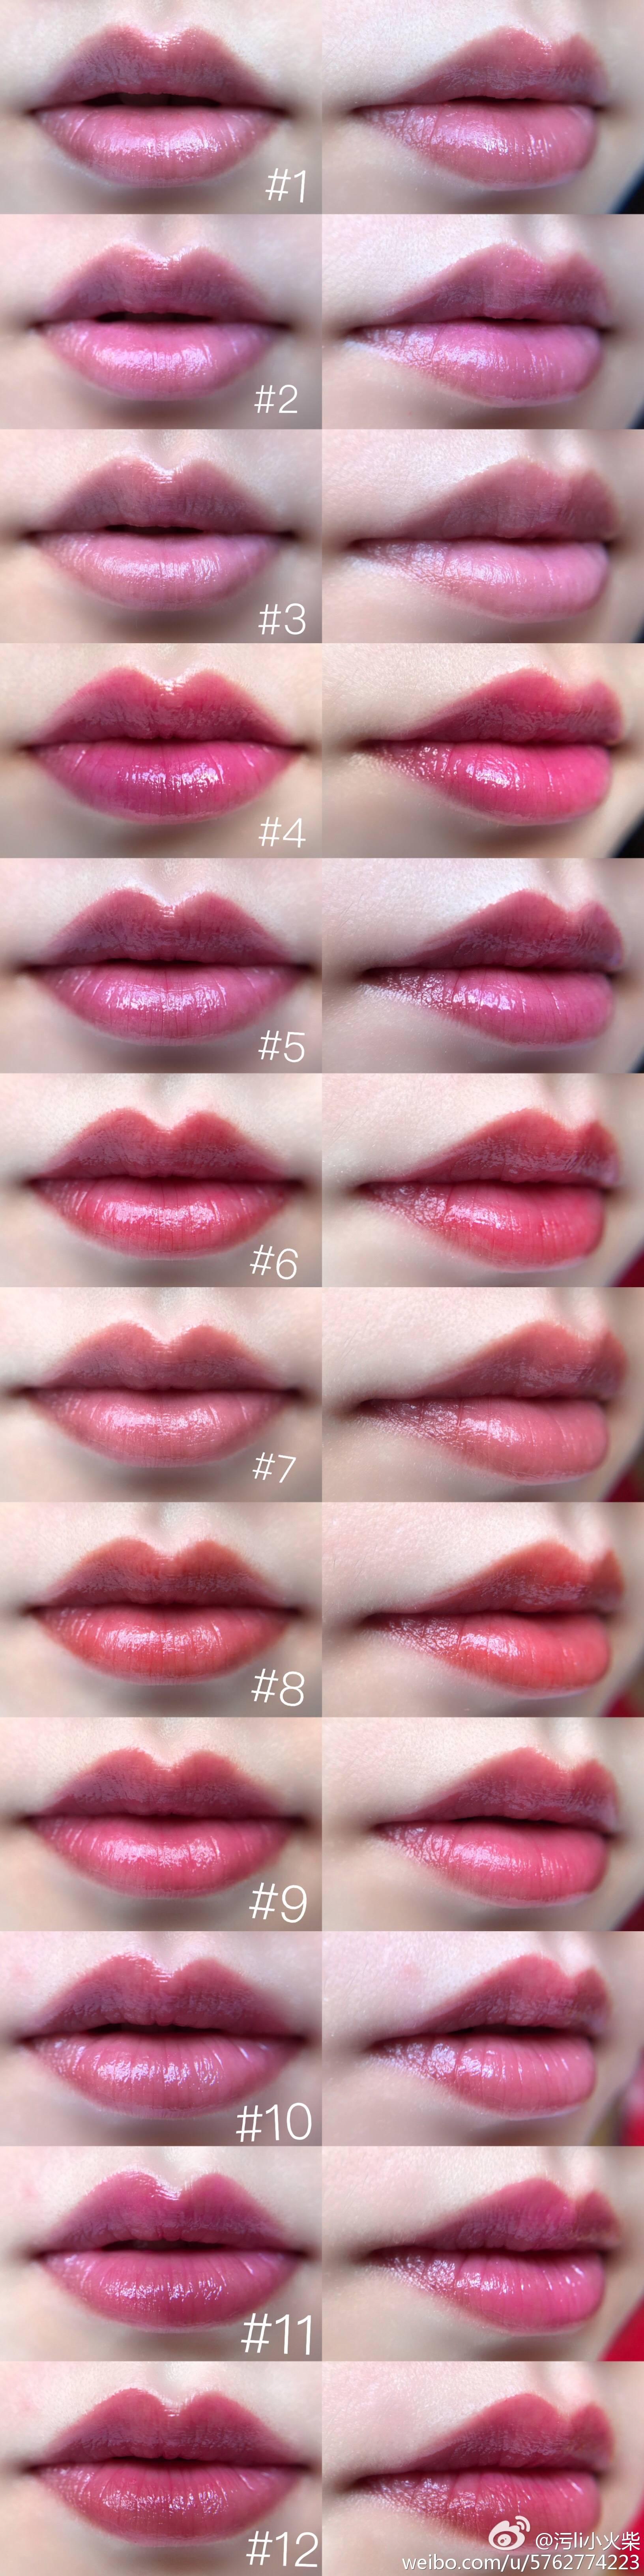 n°4 desire me pink 桃色欲望                      n°5 da